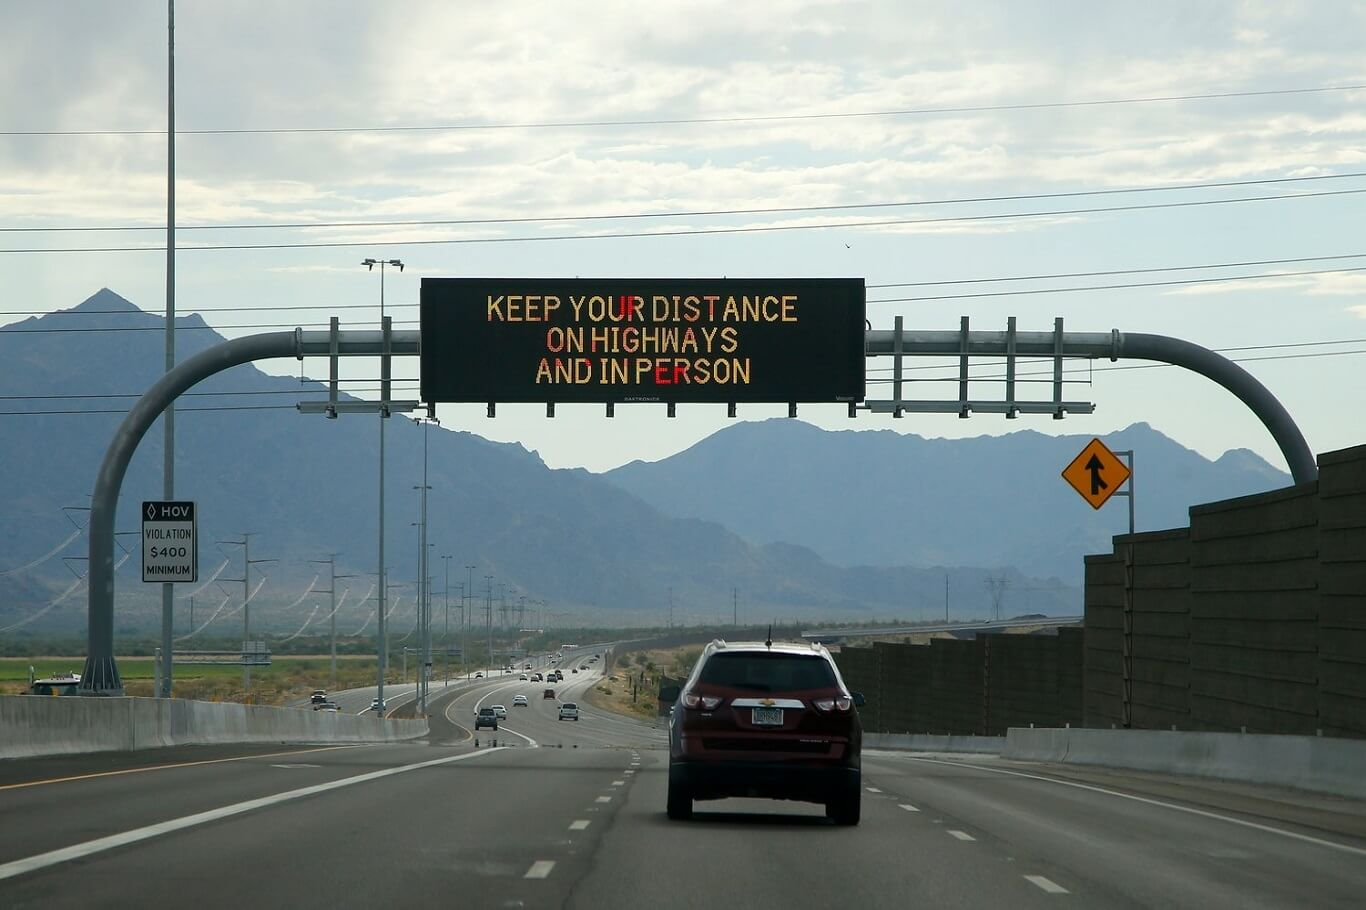 car insurance discounts due to the coronavirus